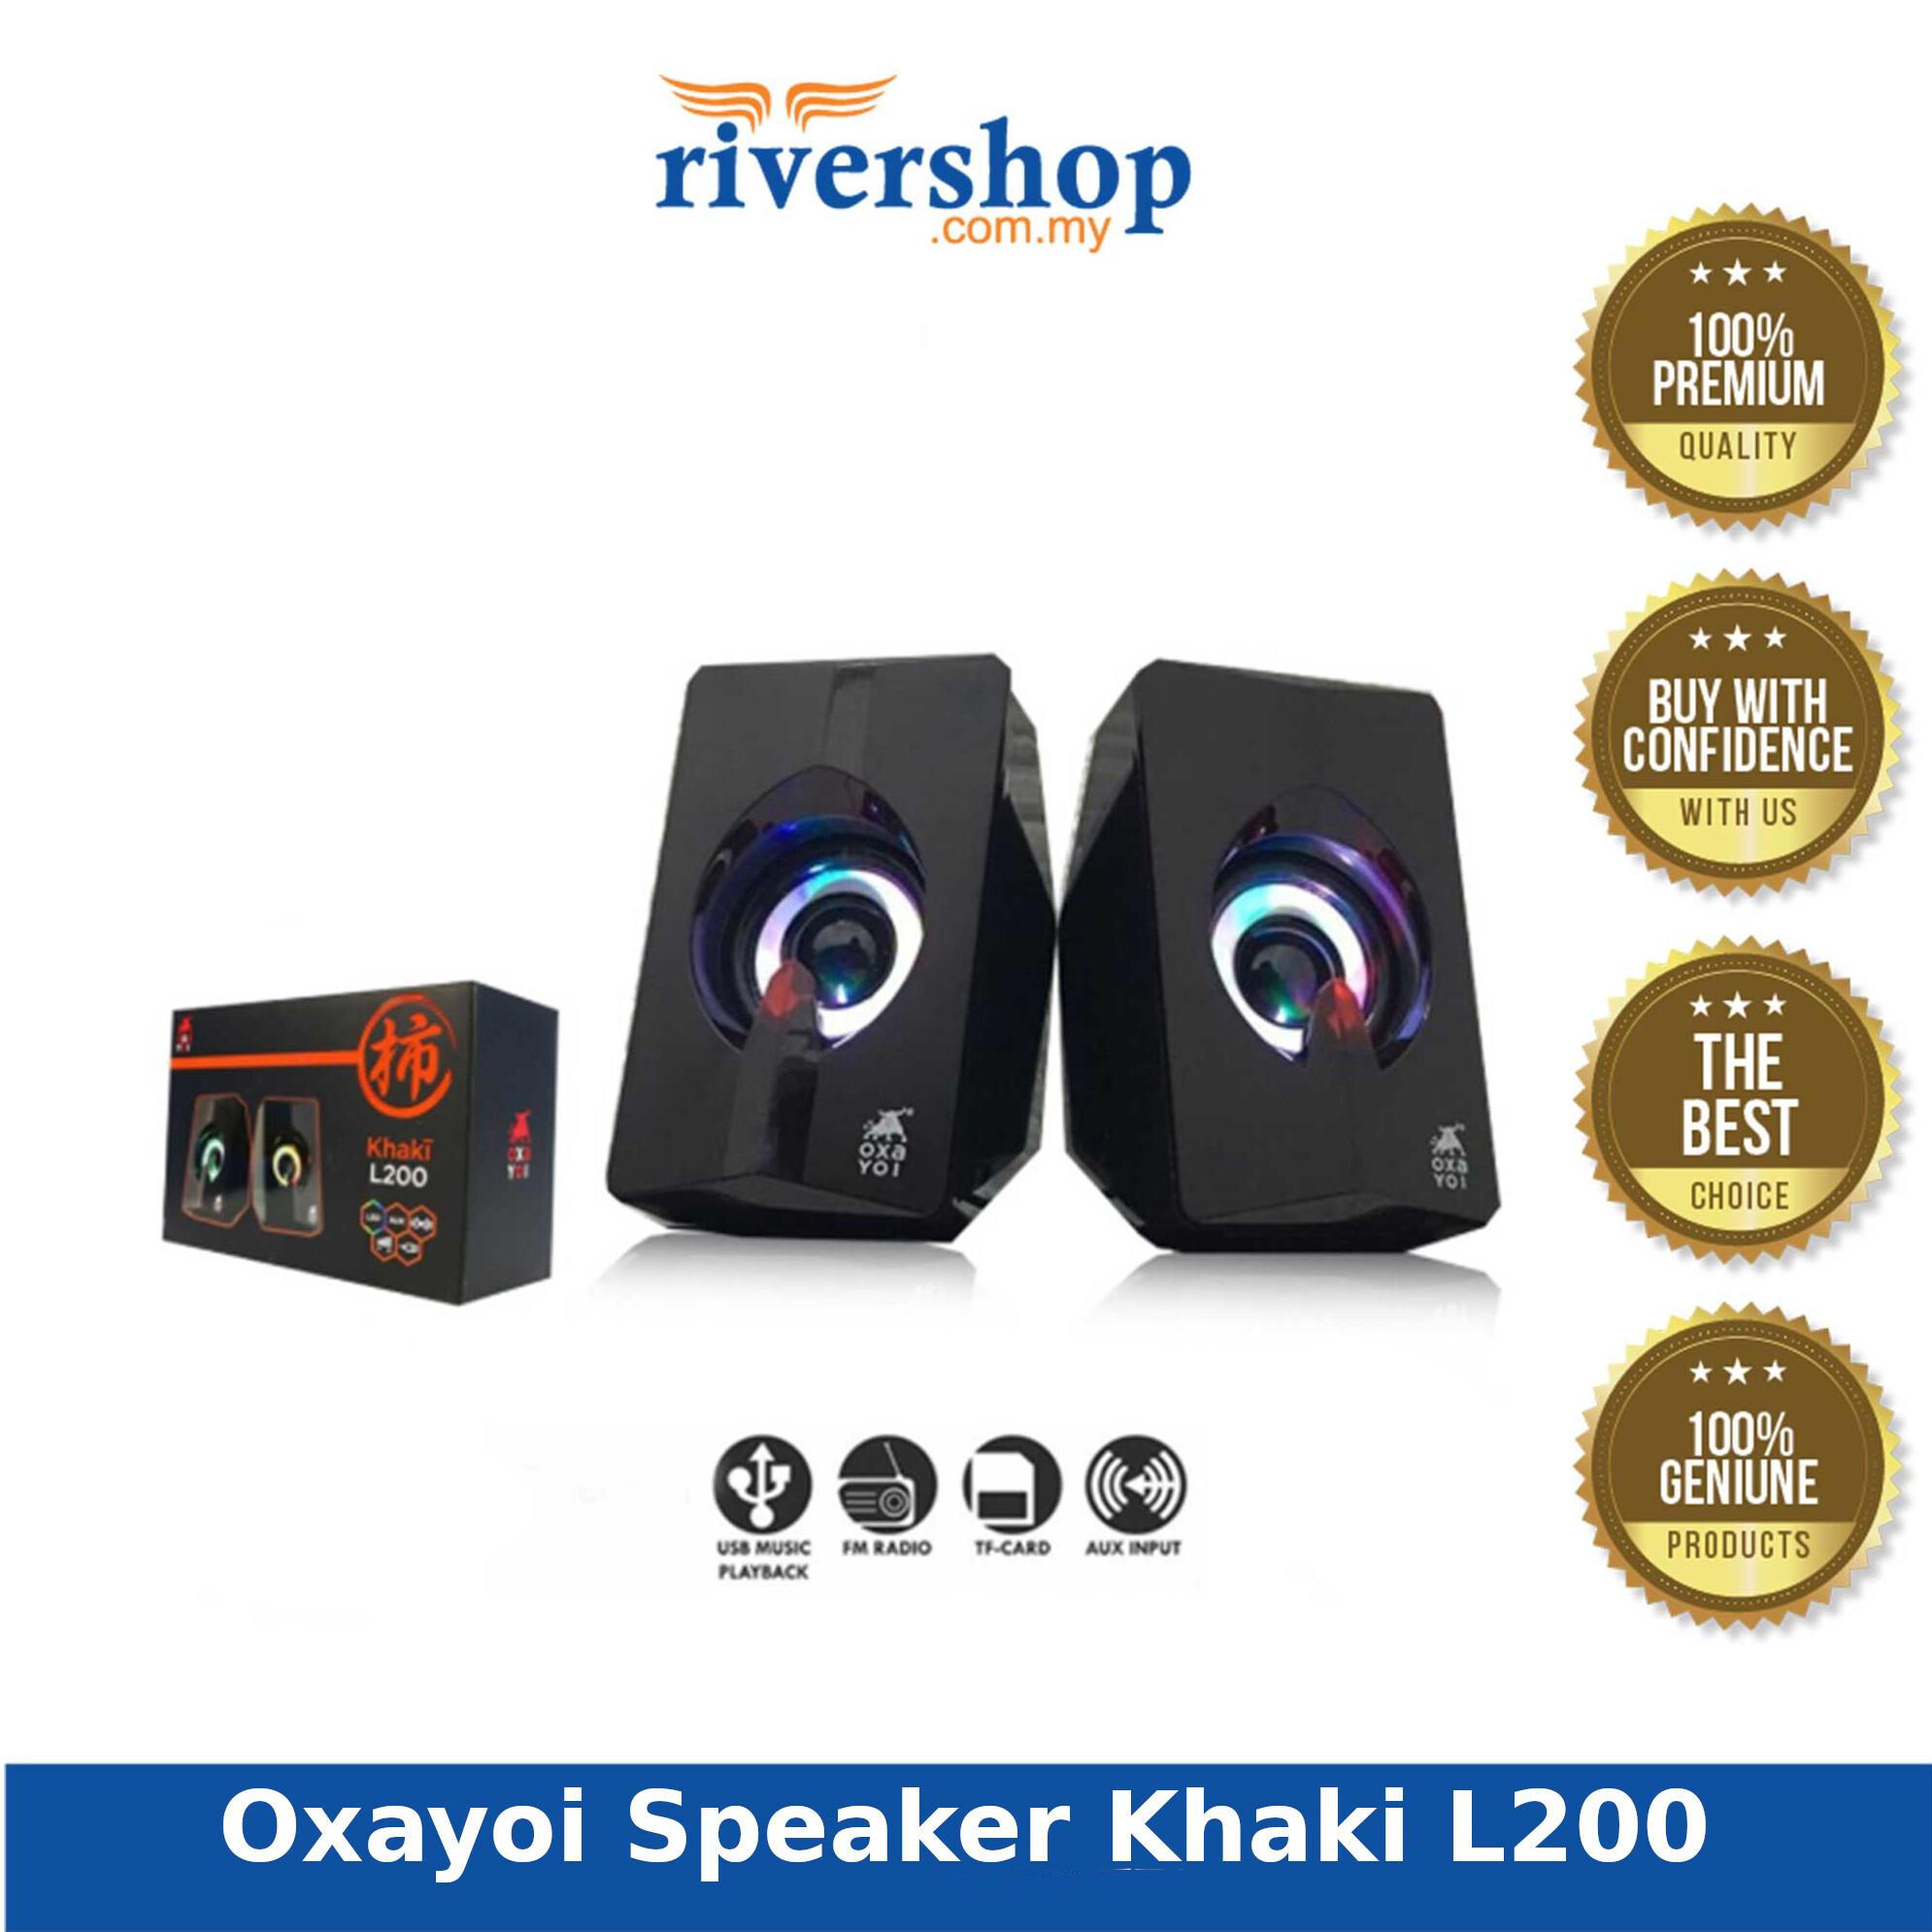 Oxayoi Speaker Khaki L200